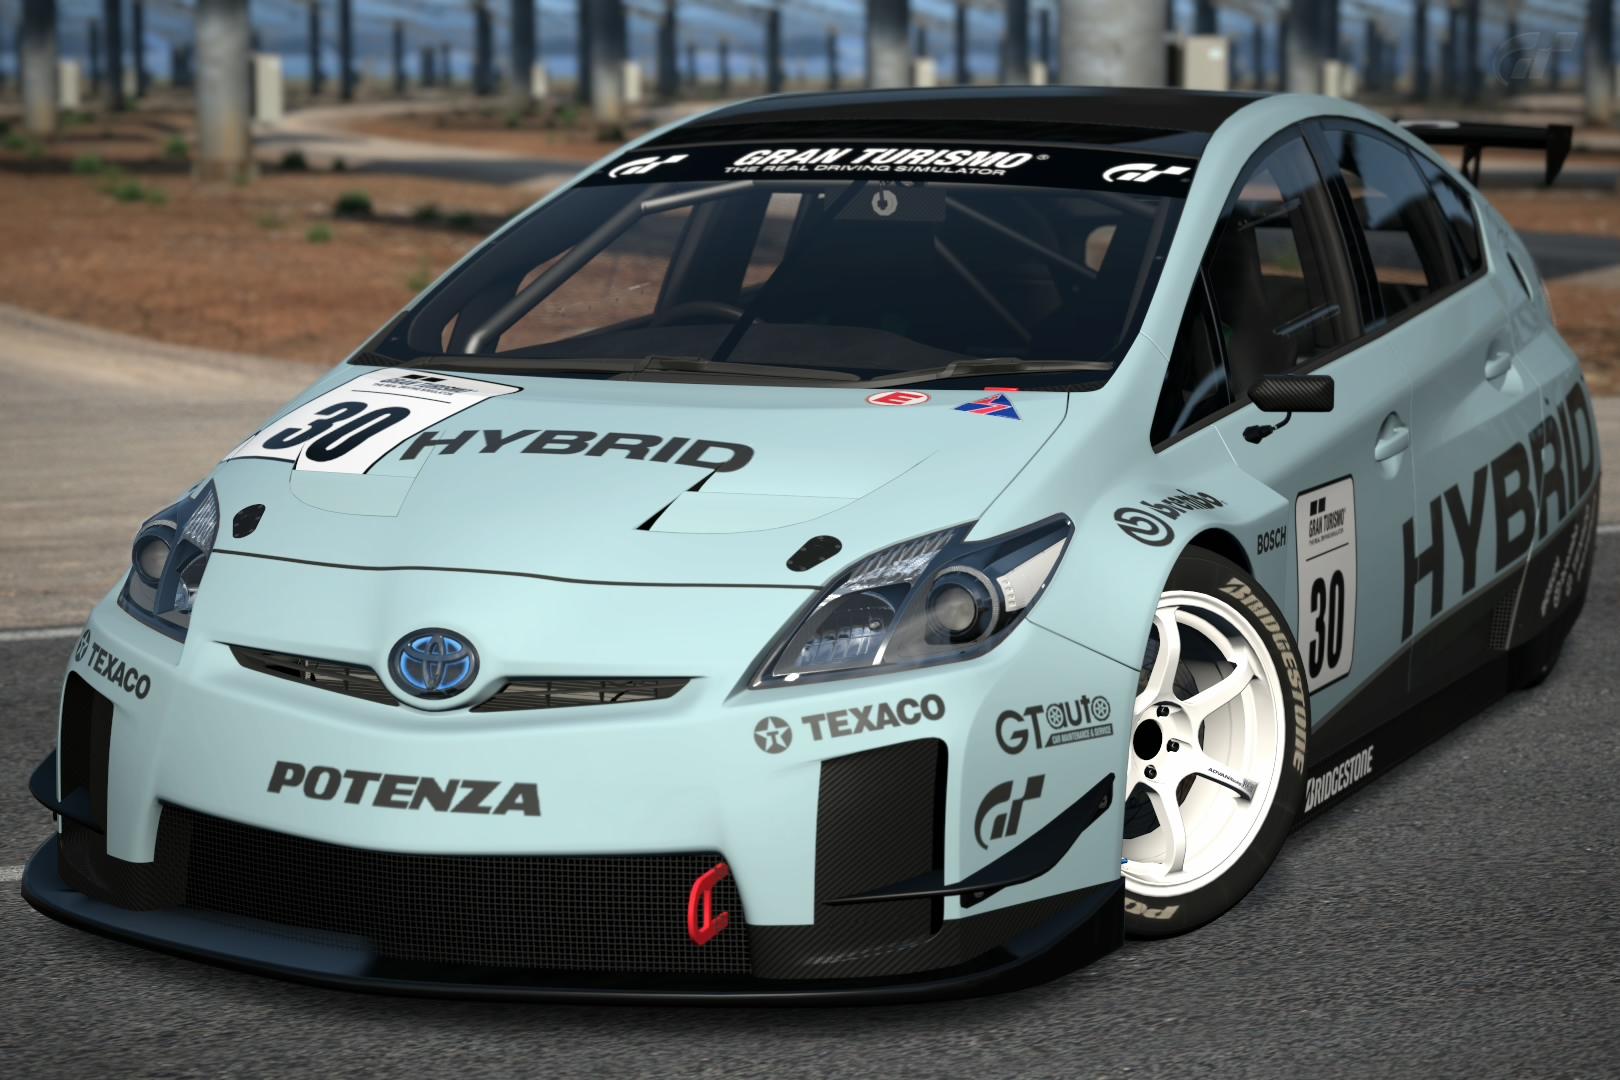 Toyota Prius Touring Car